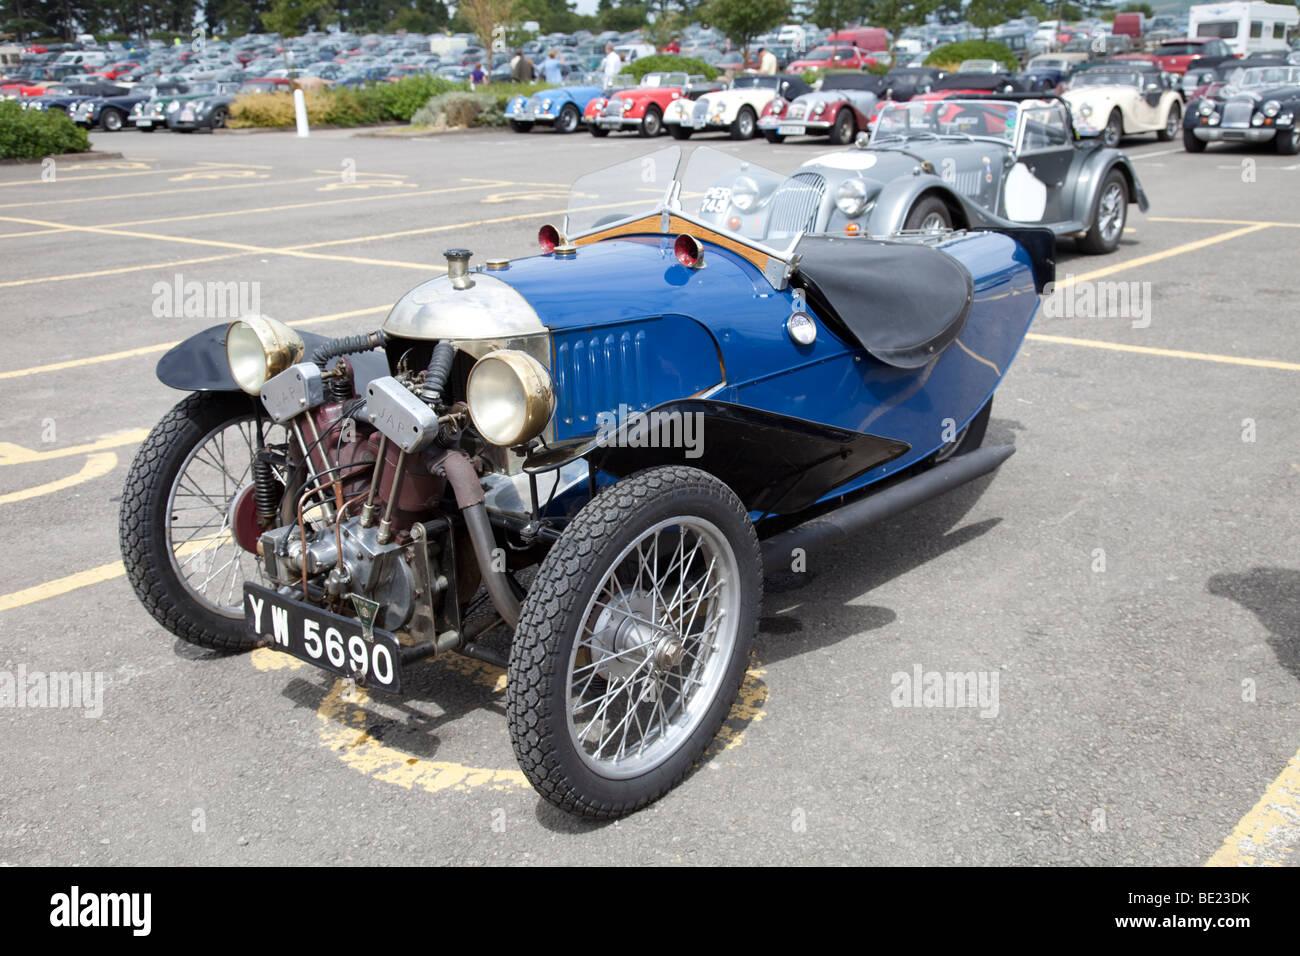 Pretty Veteran Cars For Sale Uk Images - Classic Cars Ideas - boiq.info